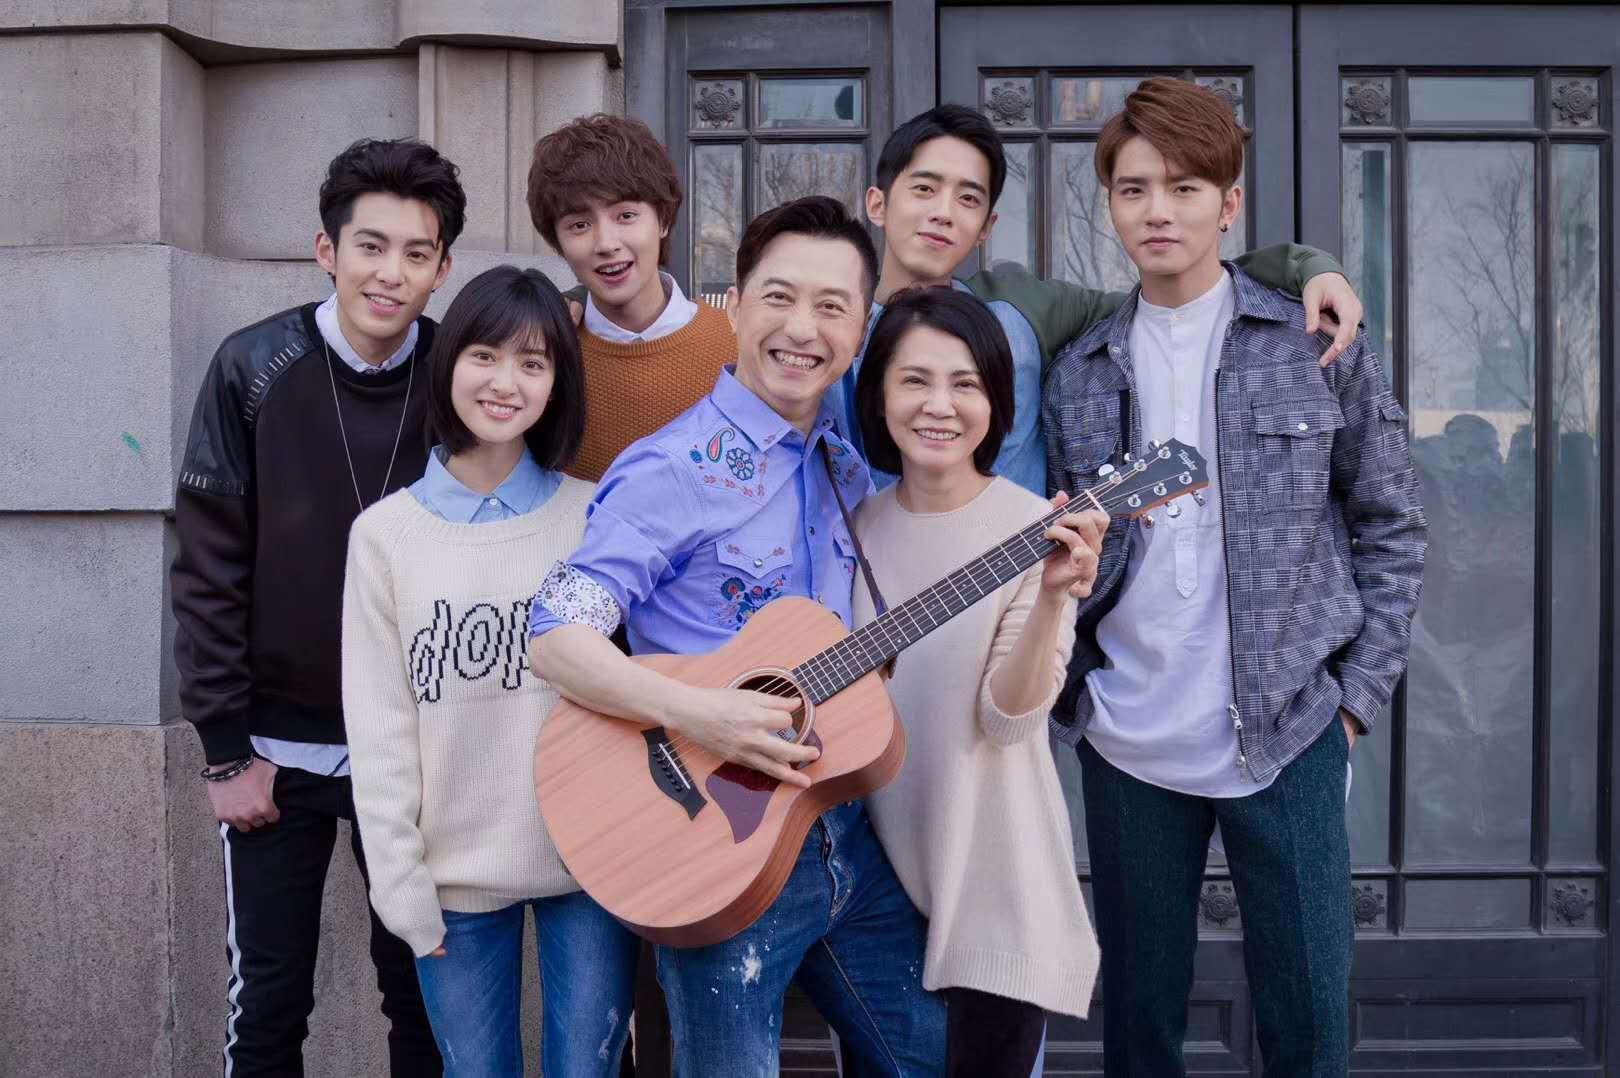 [083018] 电视剧流星花园 Weibo Update Meteor Garden Ending!! A